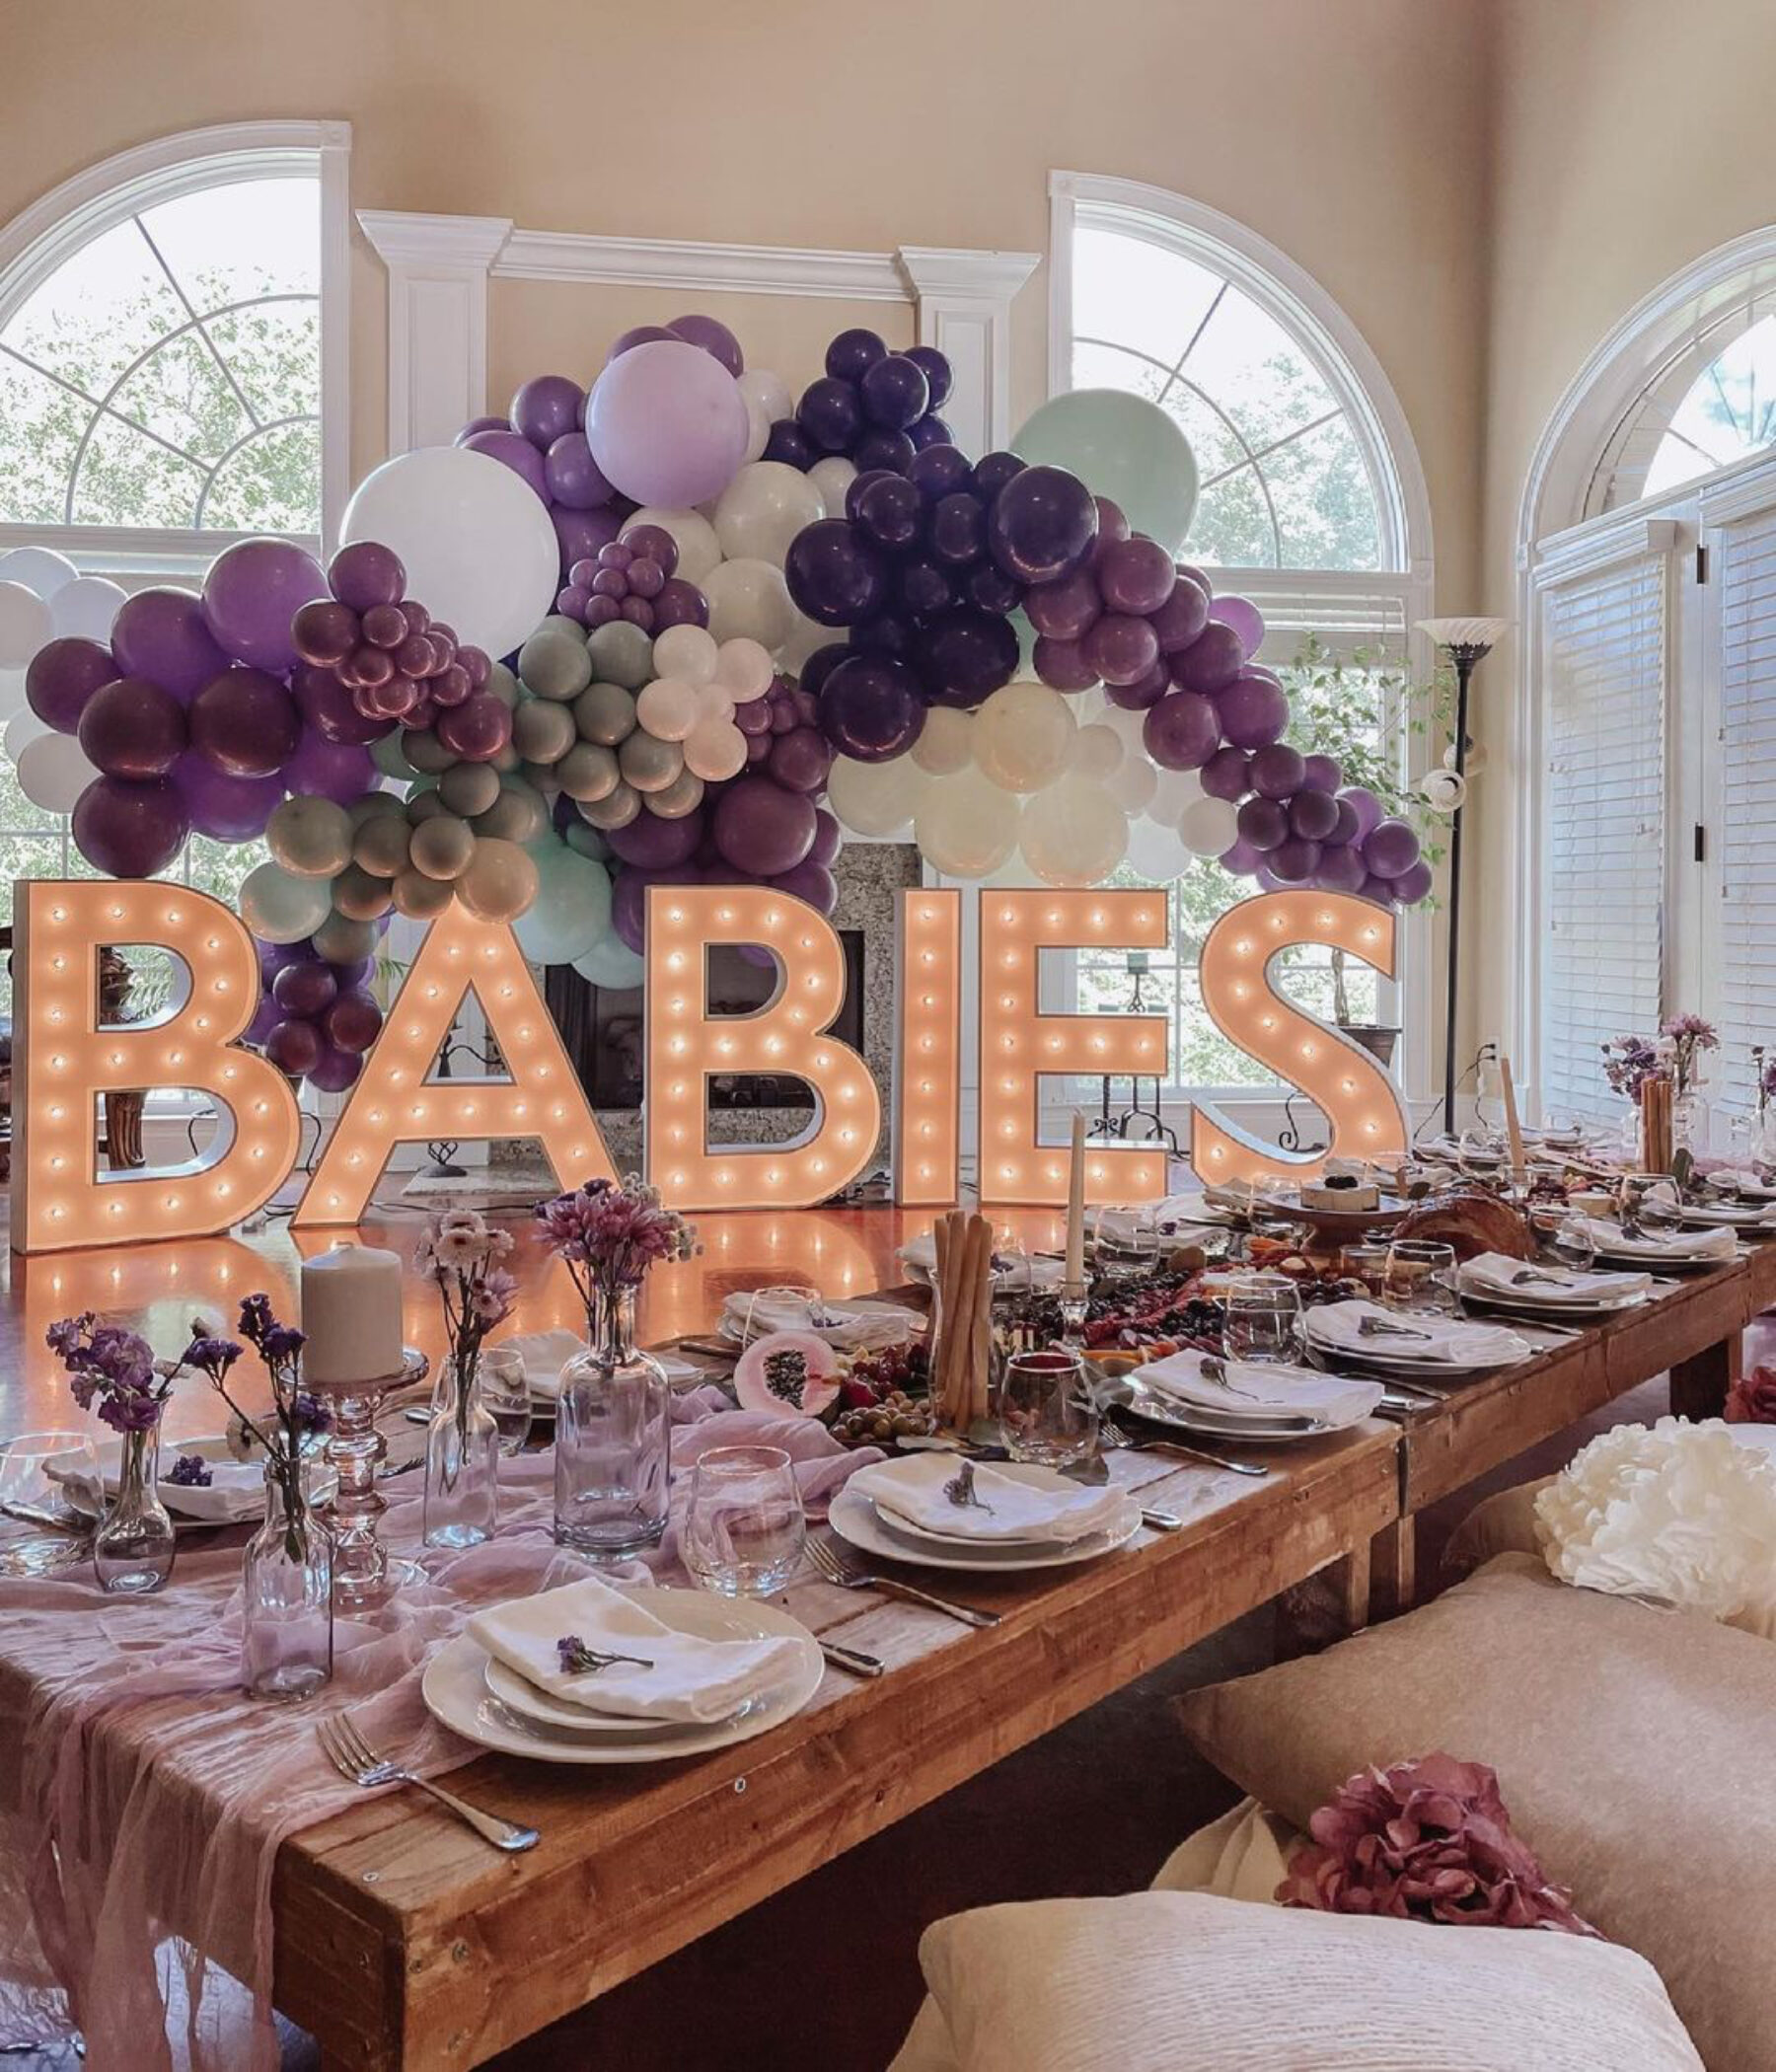 Light Up Your Next Celebration: Meet Letter Bright | Nashville Baby Guide